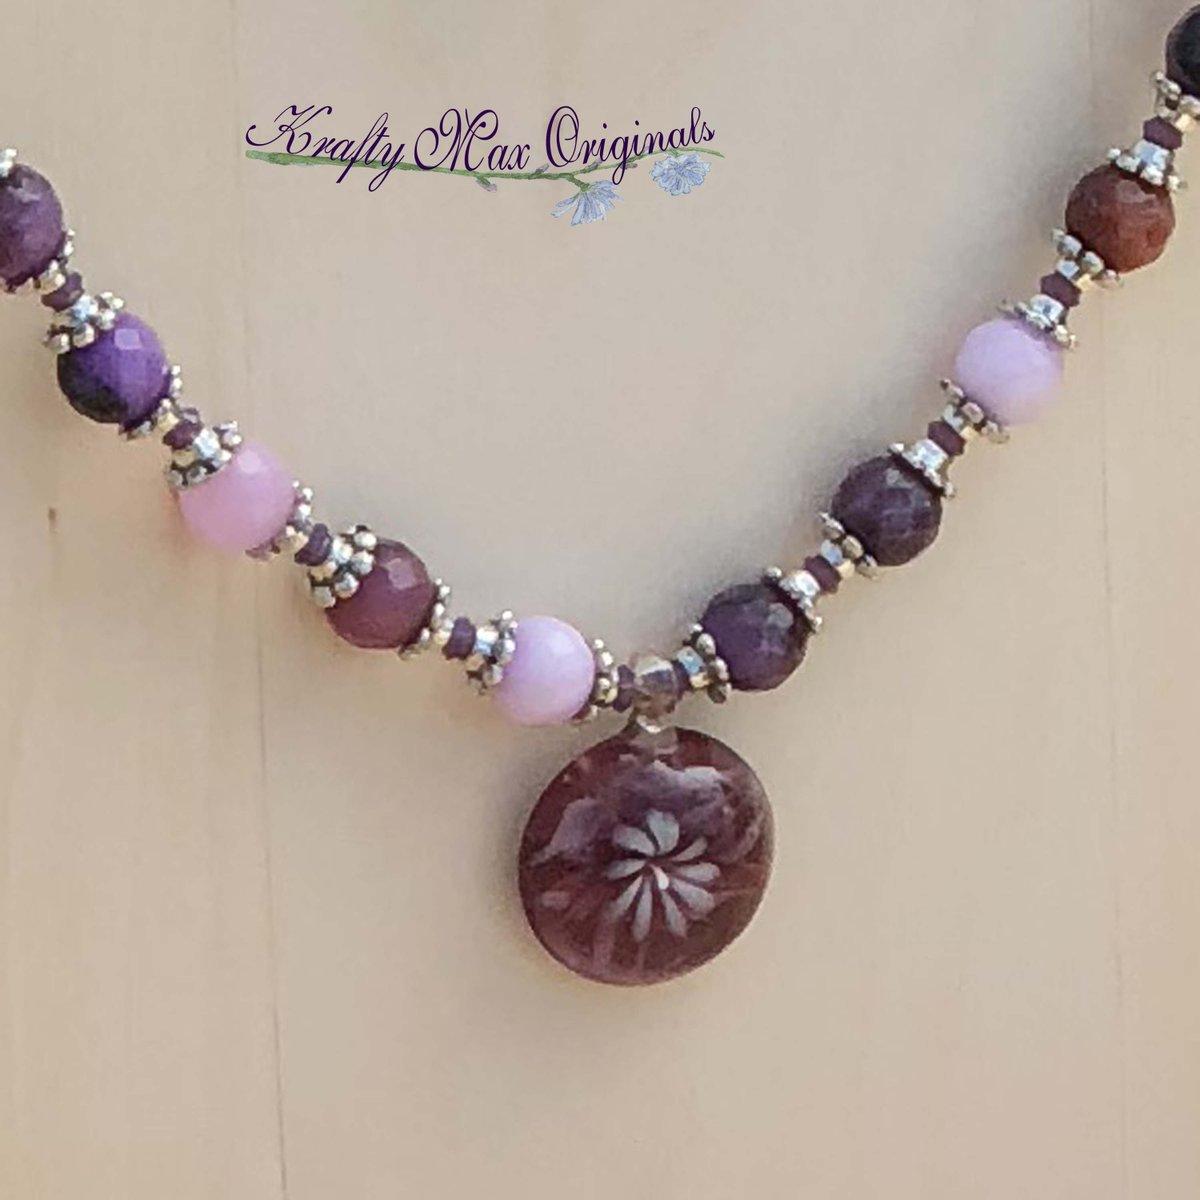 Purple Gemstone and Flowers with Swarovski Crystals Necklace Set $48  #handmade #jewelry #supporthandmade #buyhandmade #handmadelove #jewelrydesigner #jewelryart #uniquejewelry #handcrafted #kraftymax #kmax